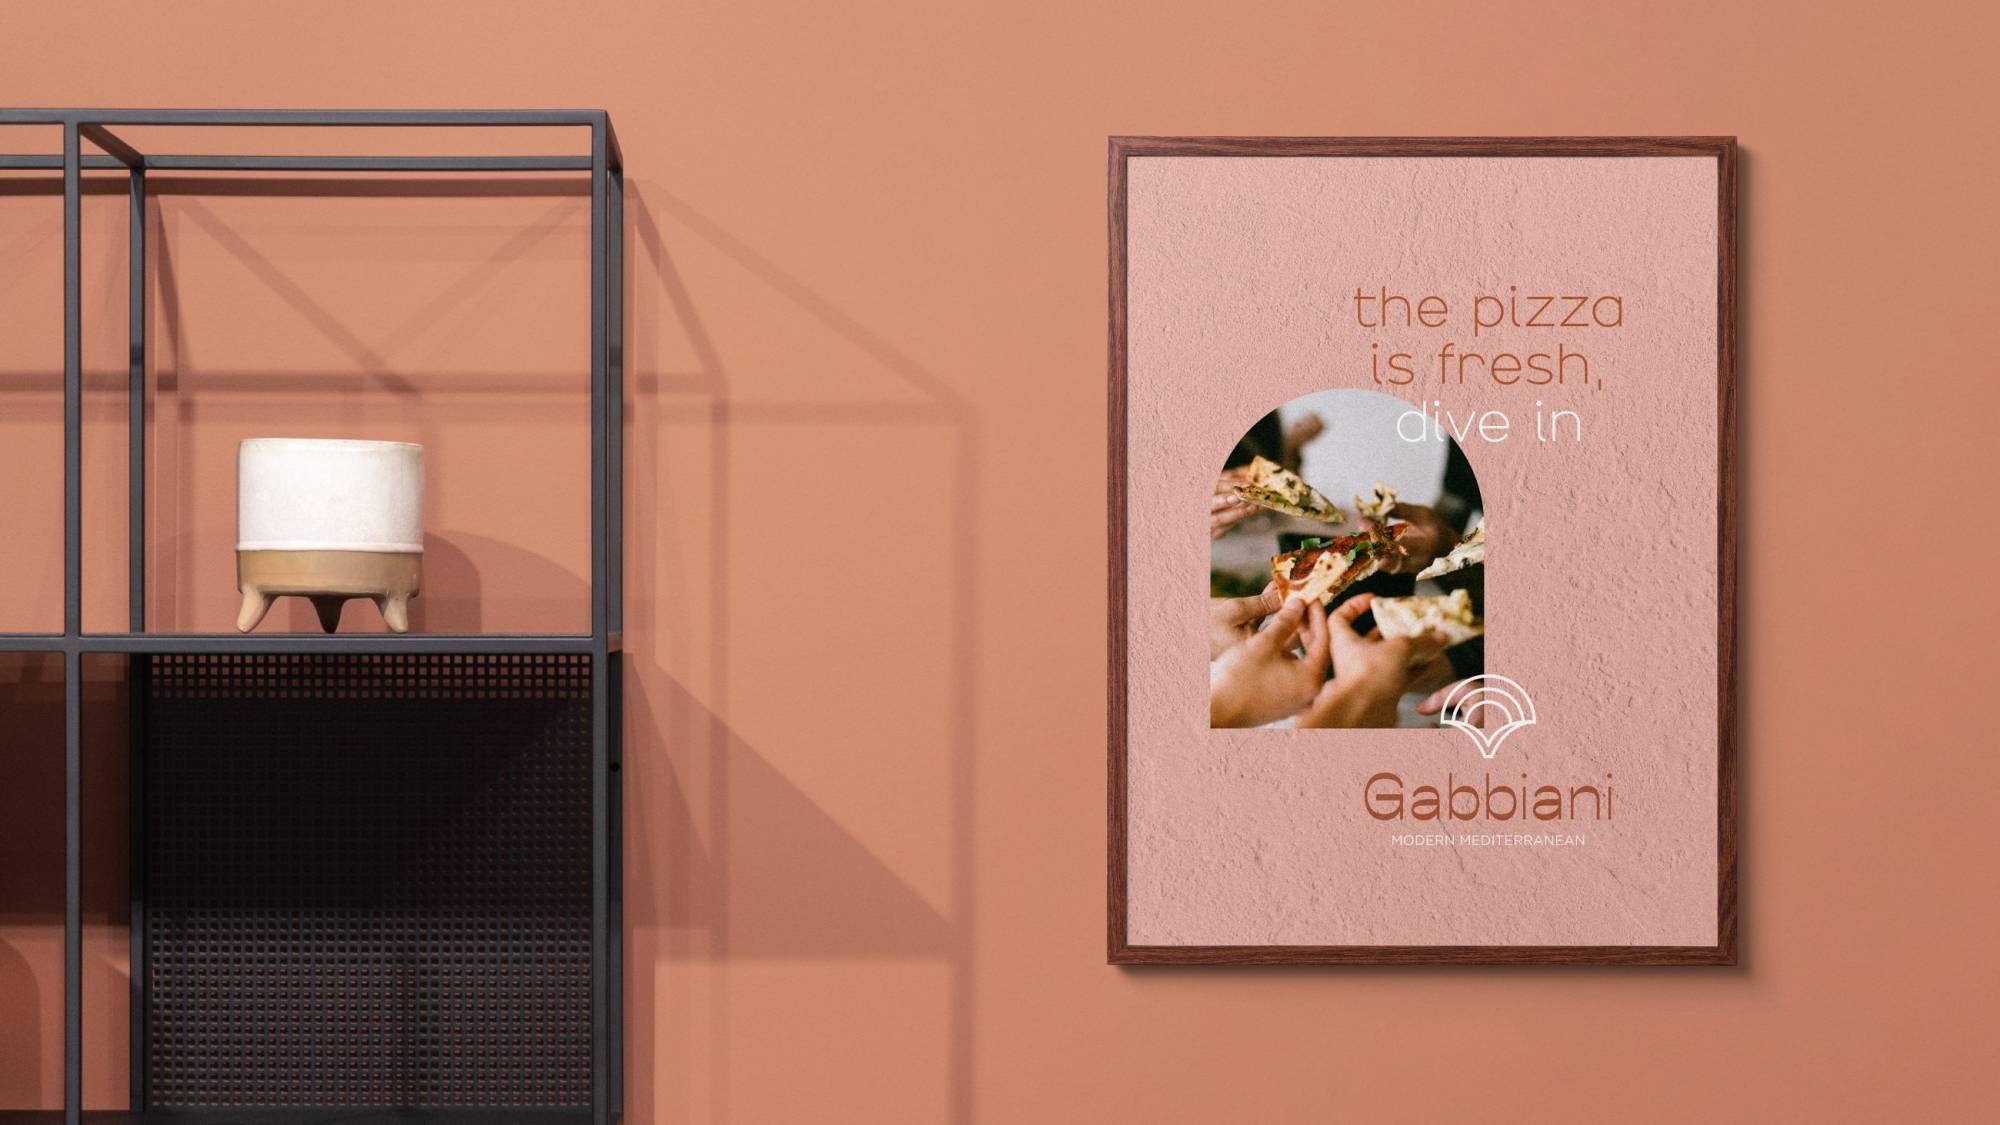 Brand identity mockup poster for cafe brand Brisbane